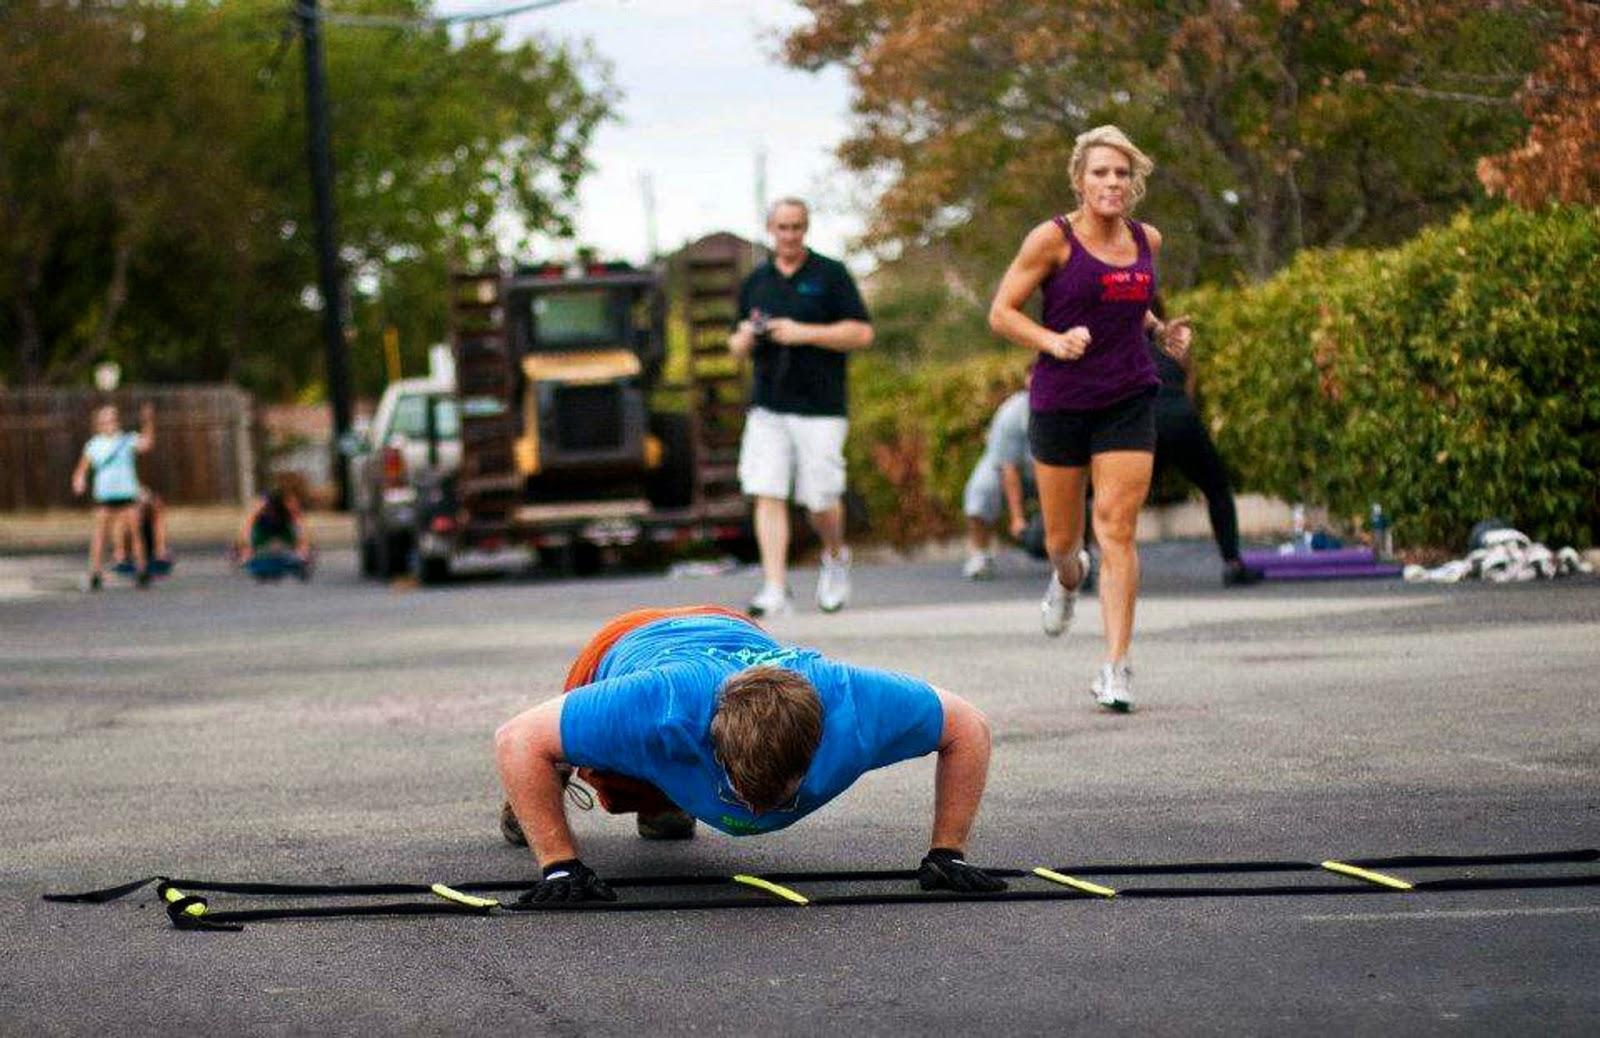 My Fitness Hut: Build Muscle, Burn Fat, Boost Metabolism